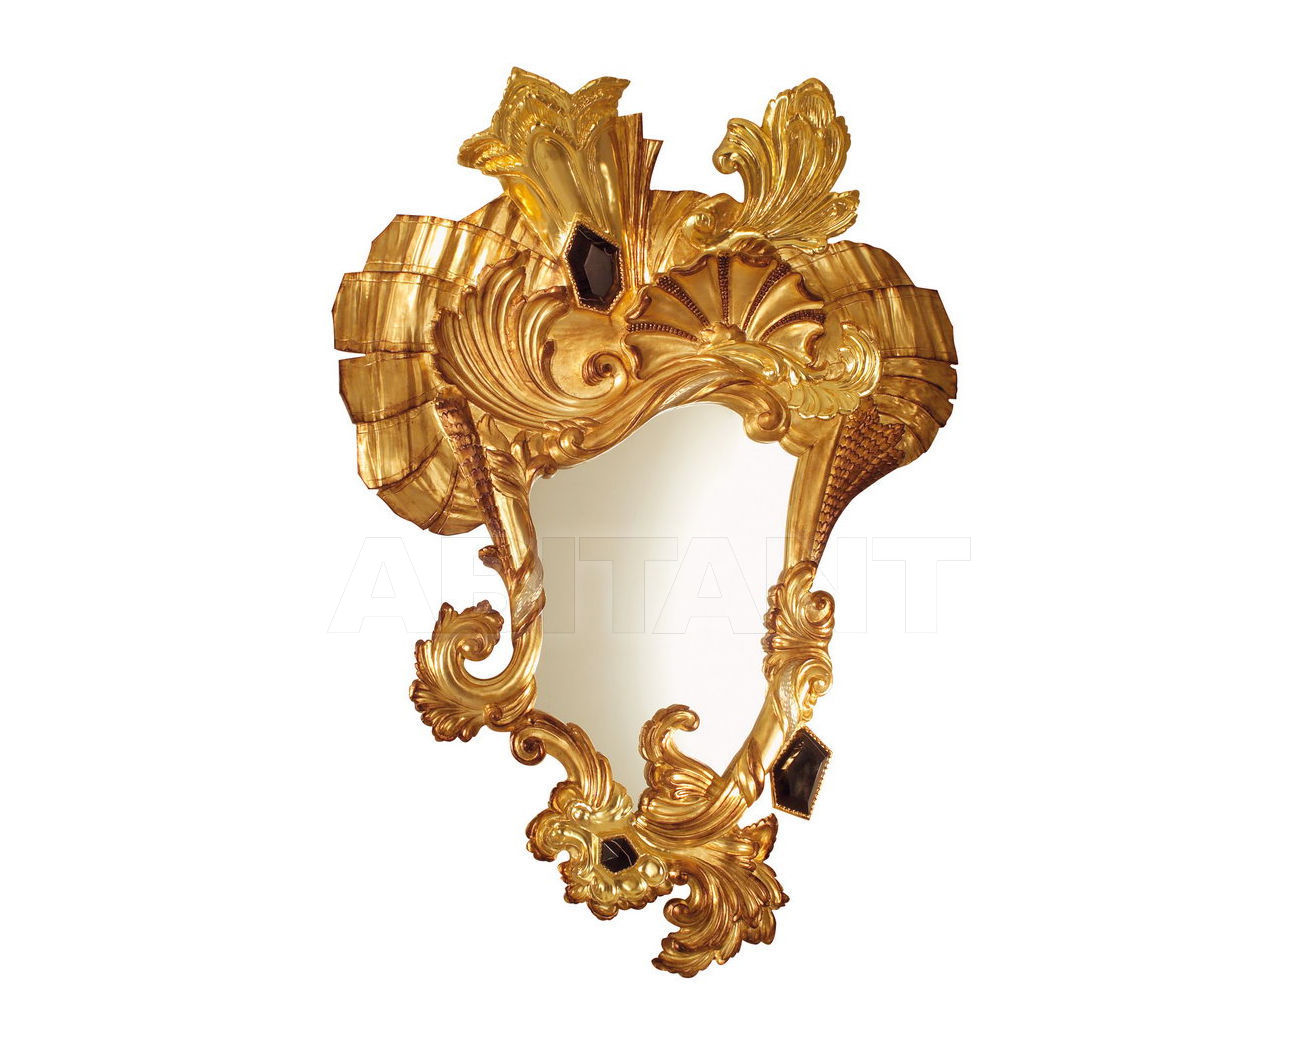 Купить Зеркало настенное Colombostile s.p.a. 2010 3650 SPA